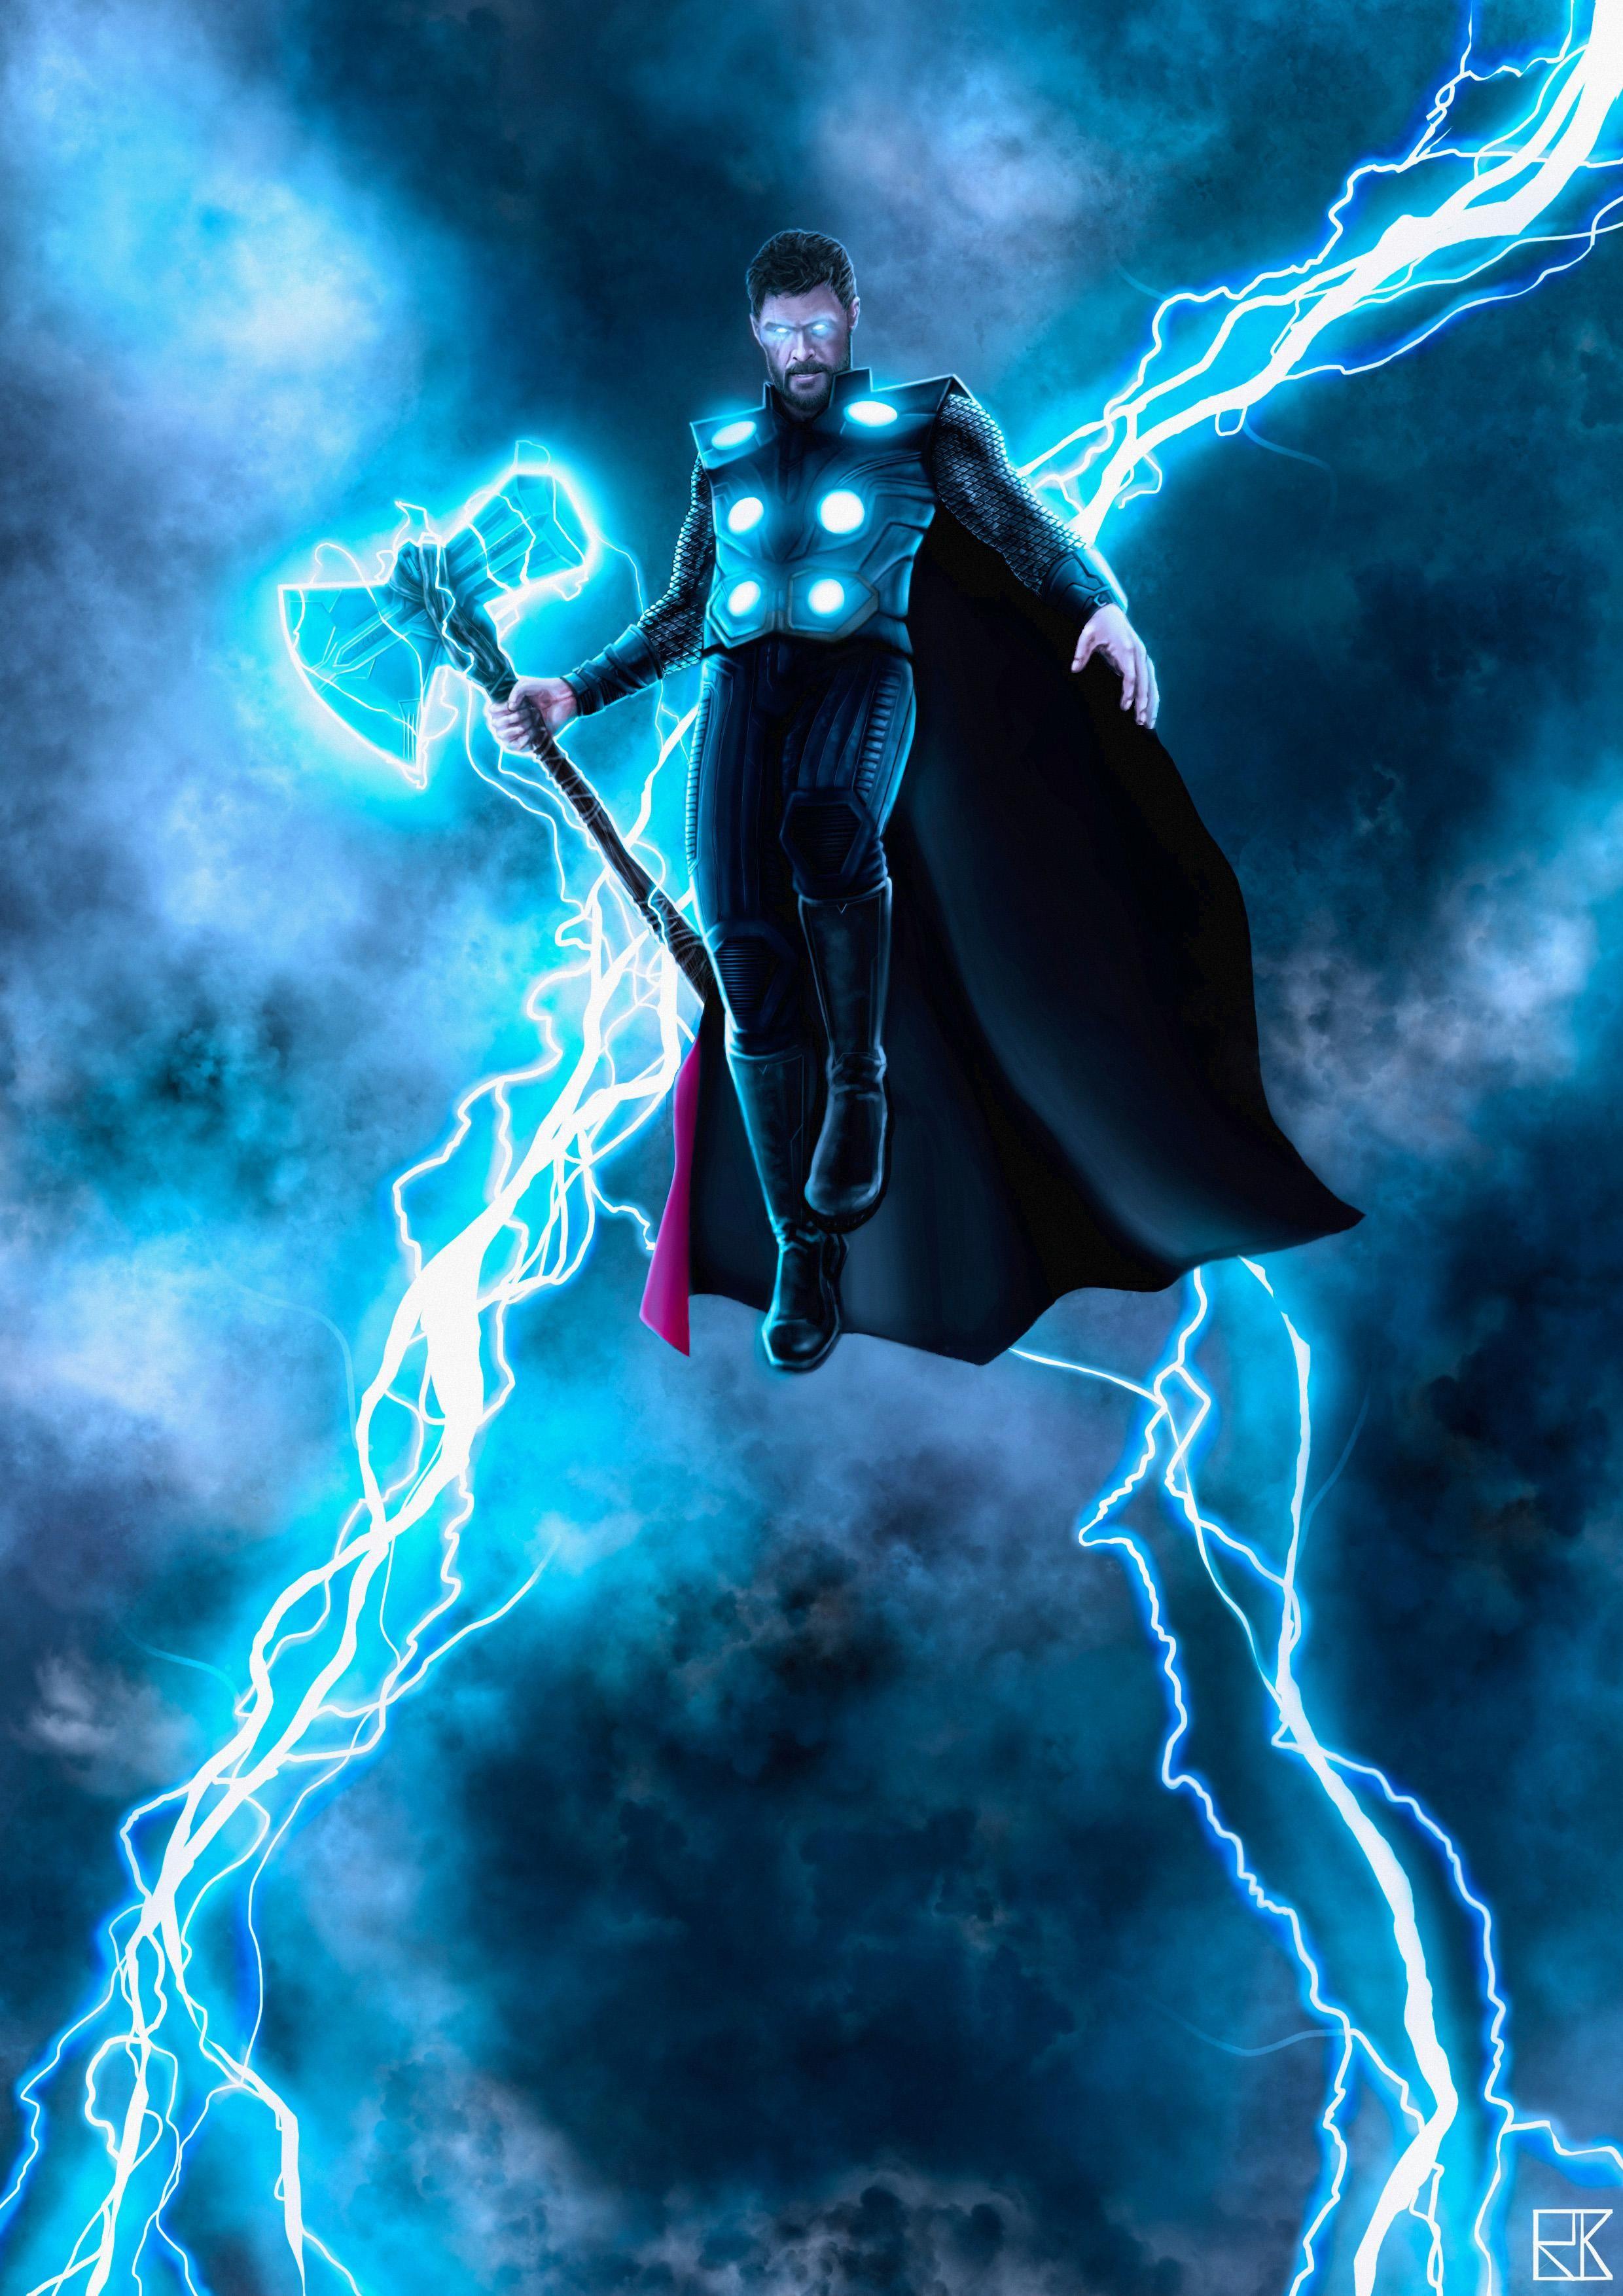 Stormbreaker Thor Wallpaper 4k - HD Wallpaper